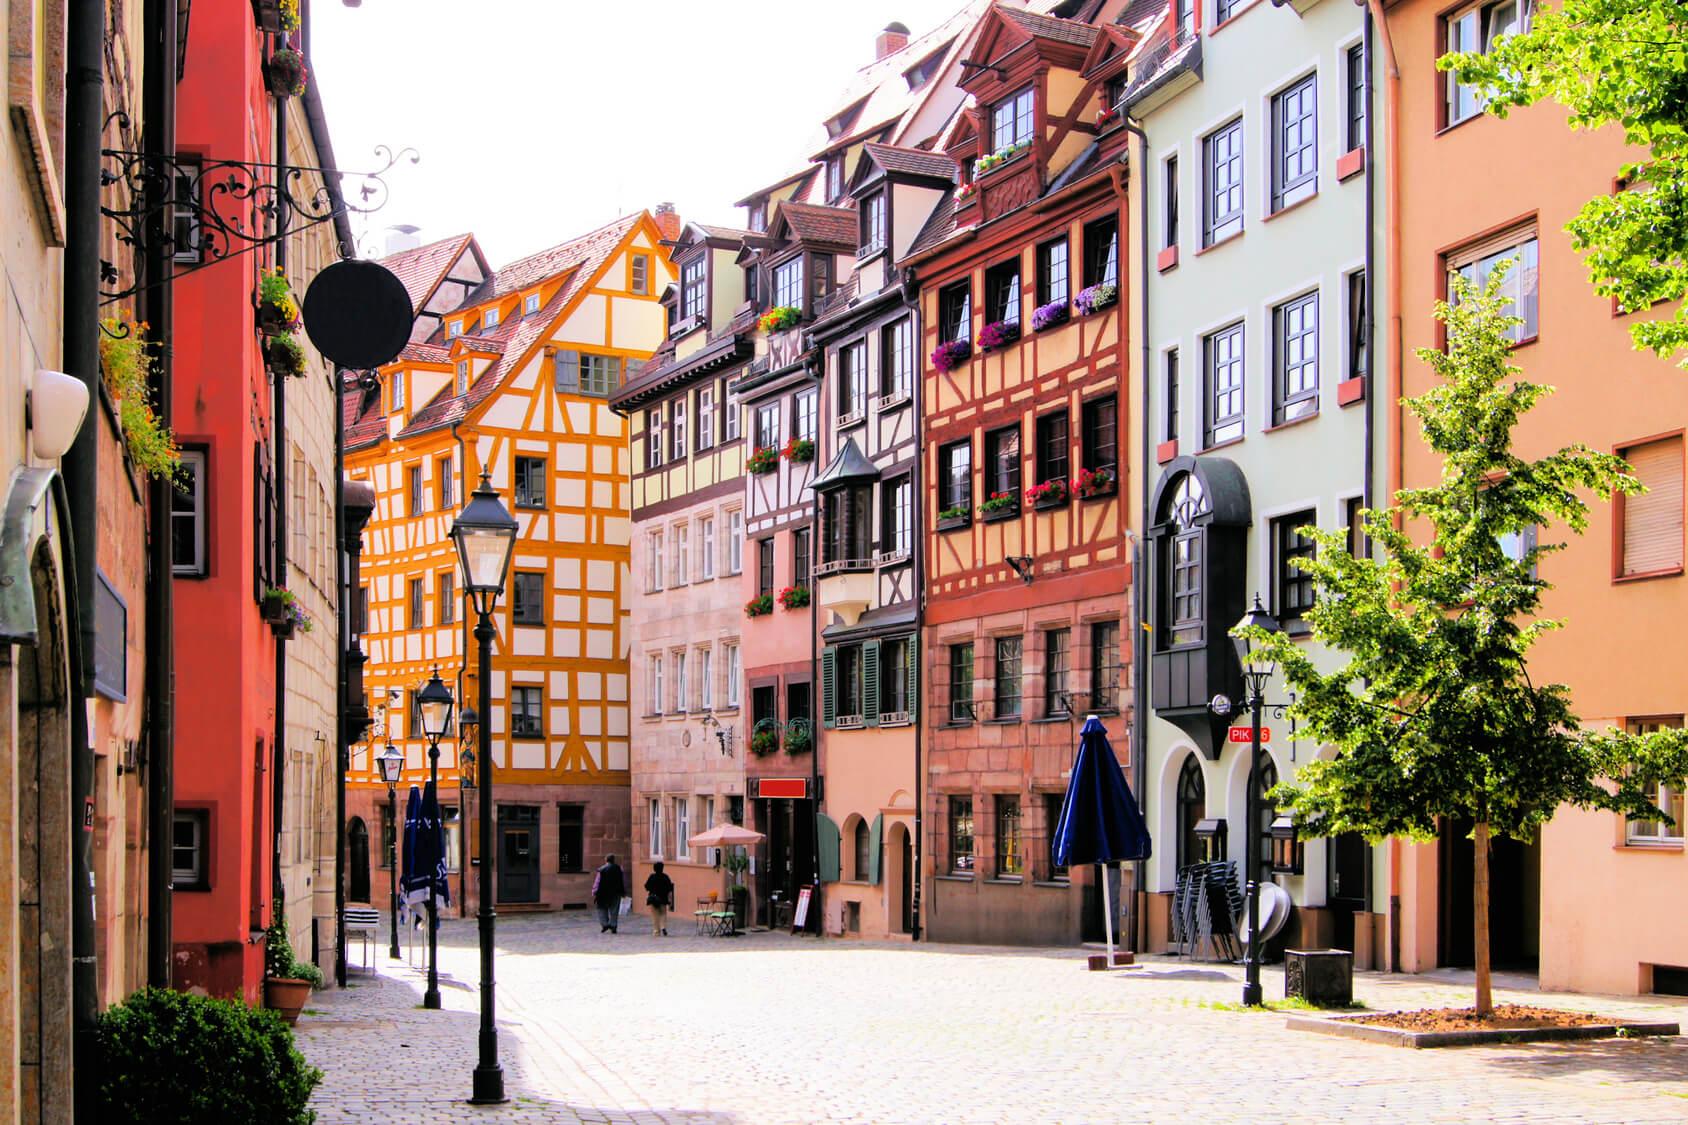 Cheap flights to Nuremberg